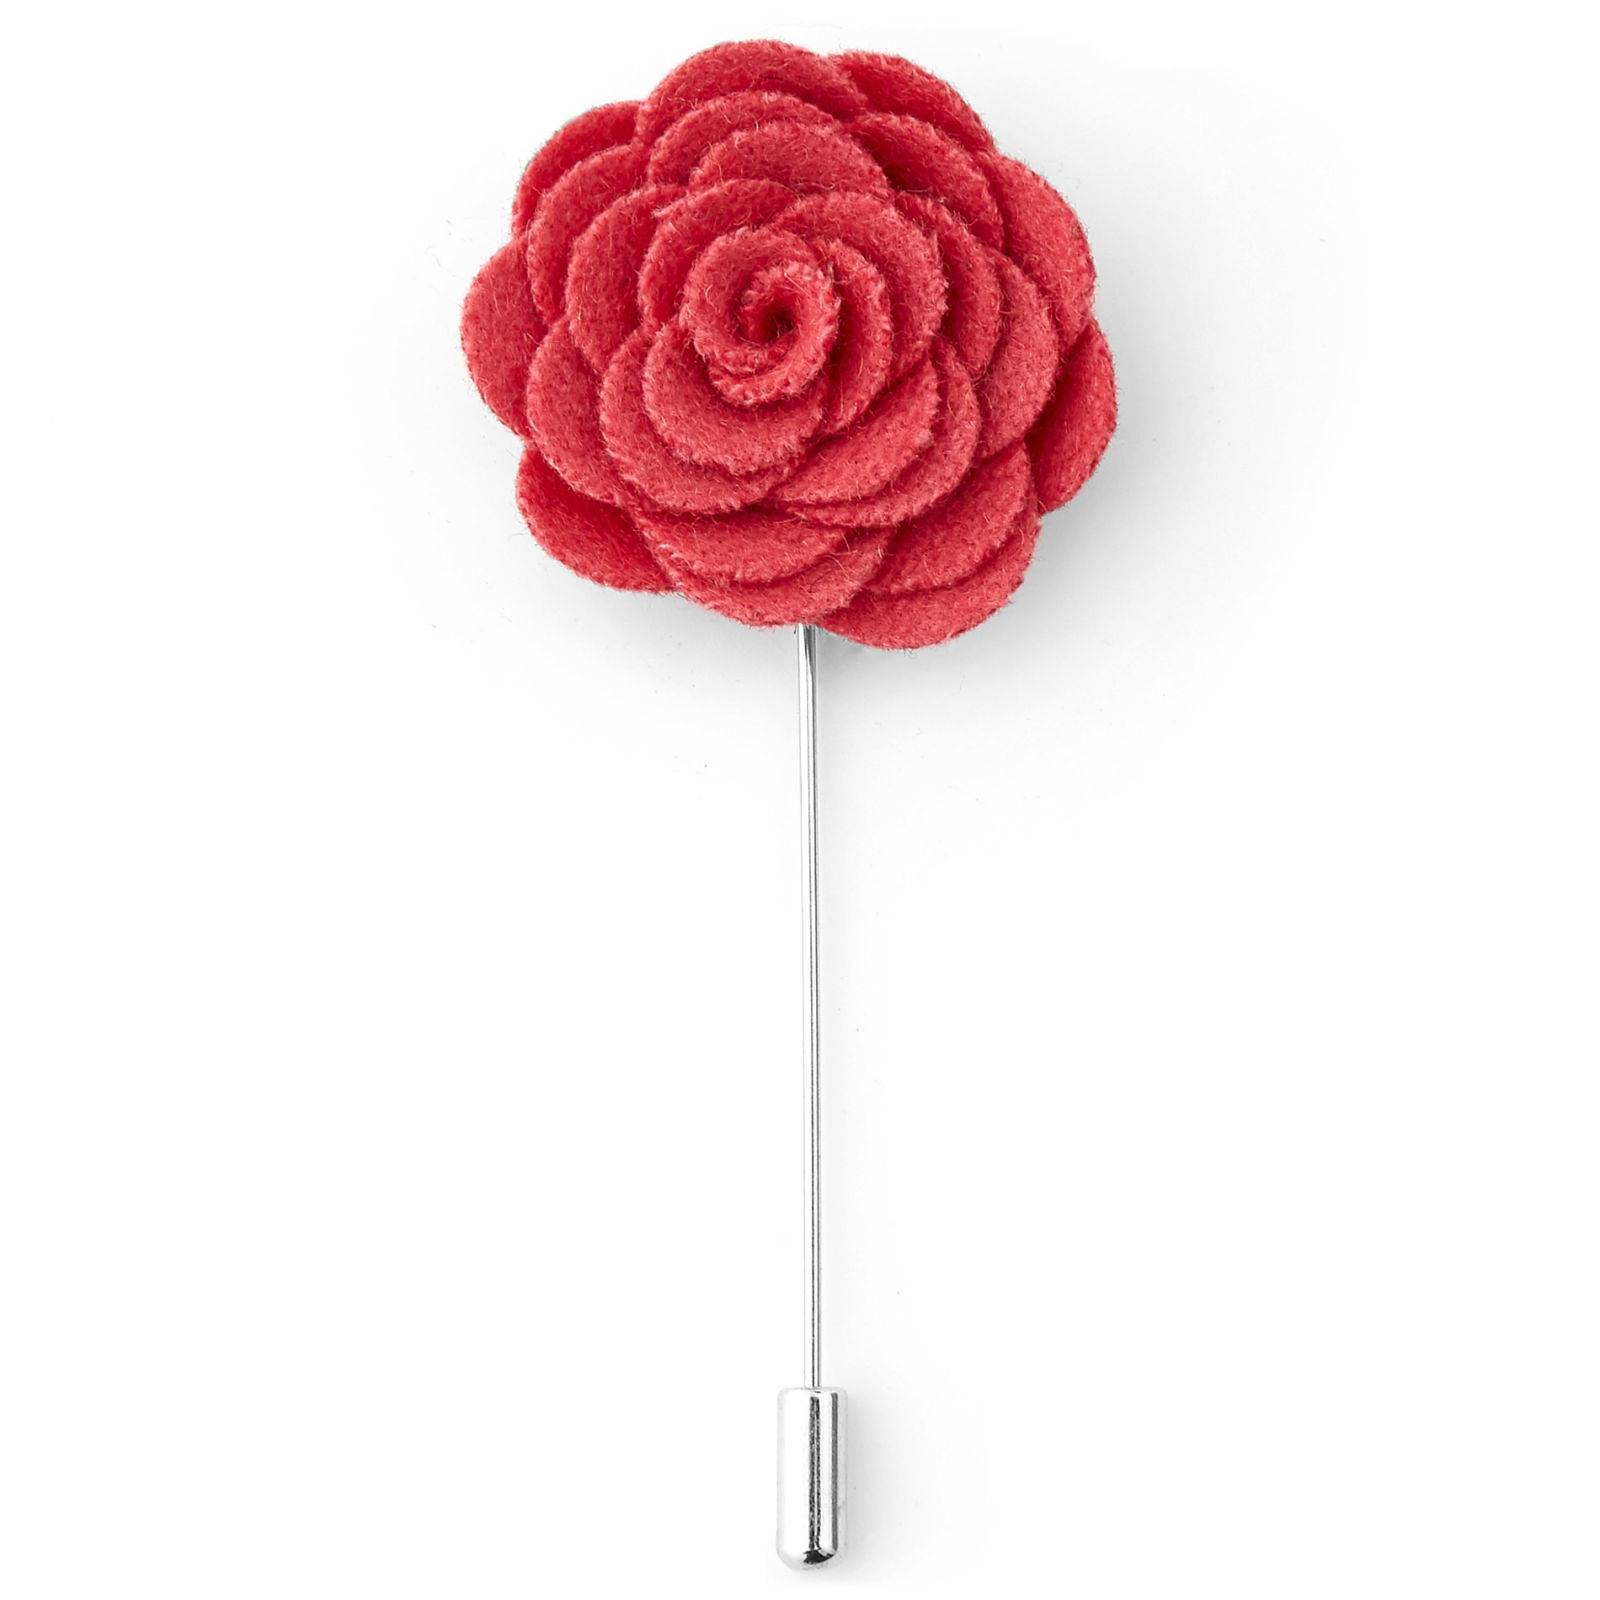 Warren Asher Punainen ruusu -rintaneula